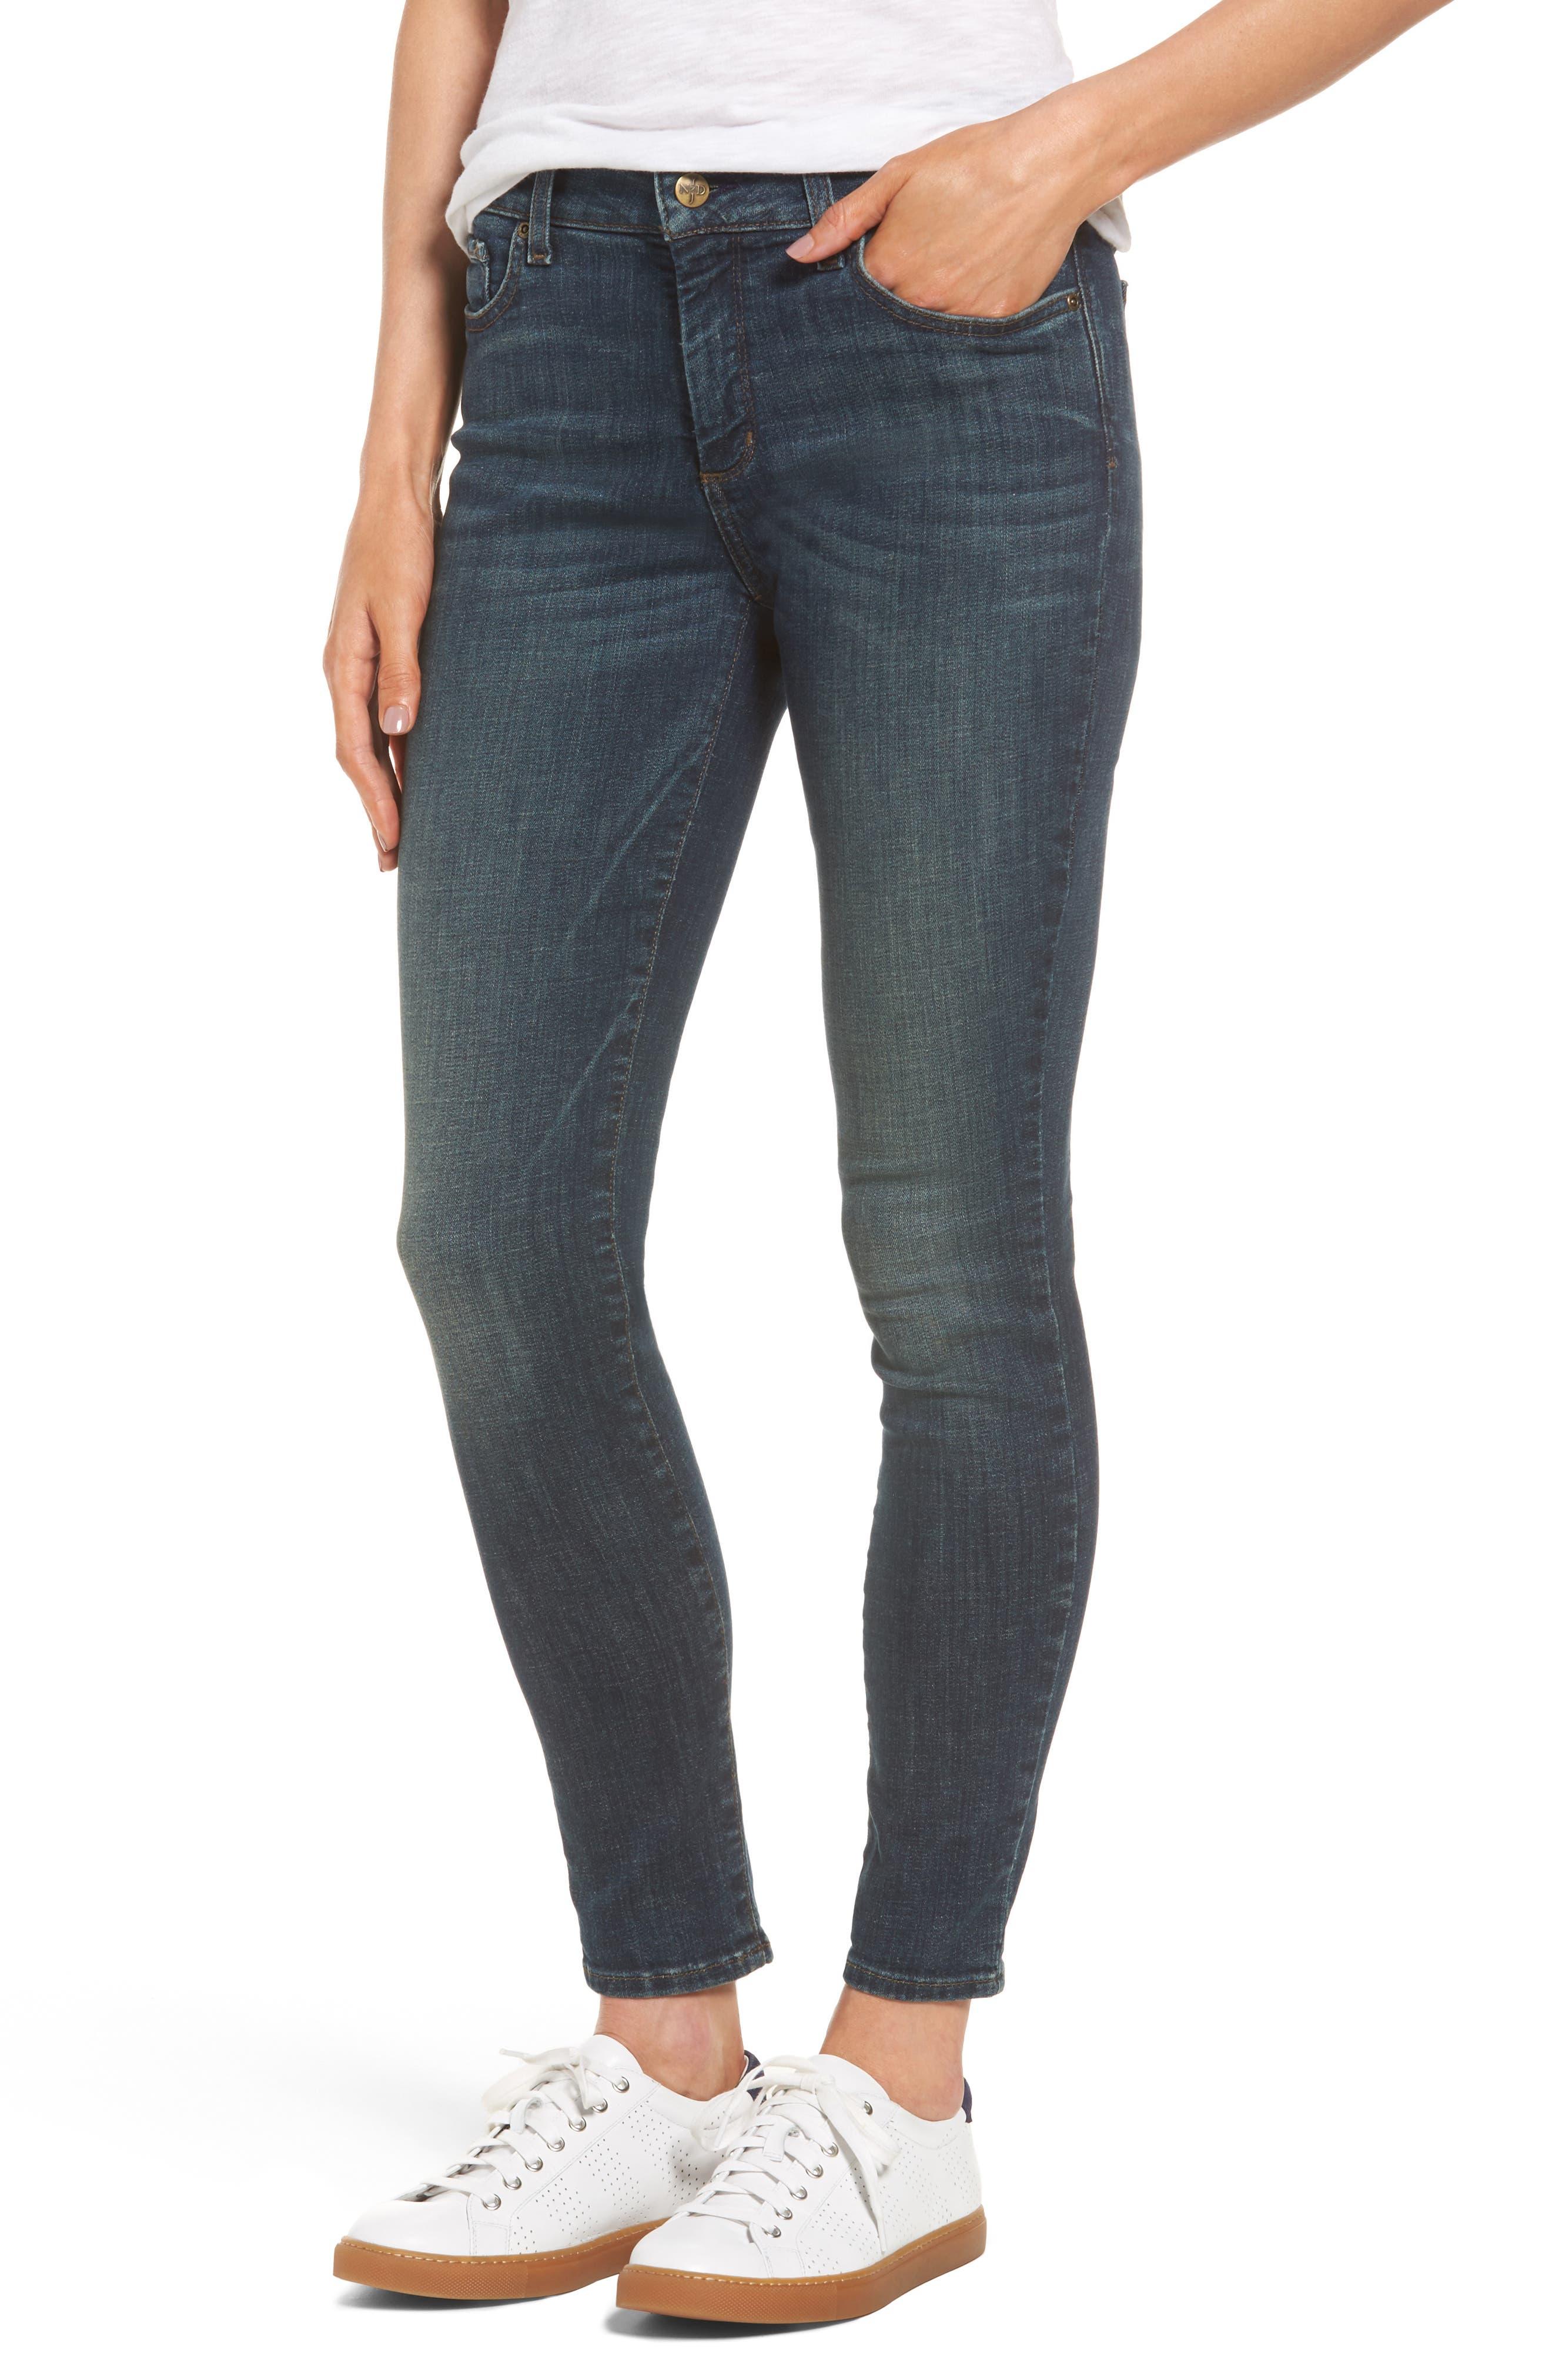 Main Image - NYDJ Ami Stretch Skinny Jeans (Desert Gold) (Regular & Petite)